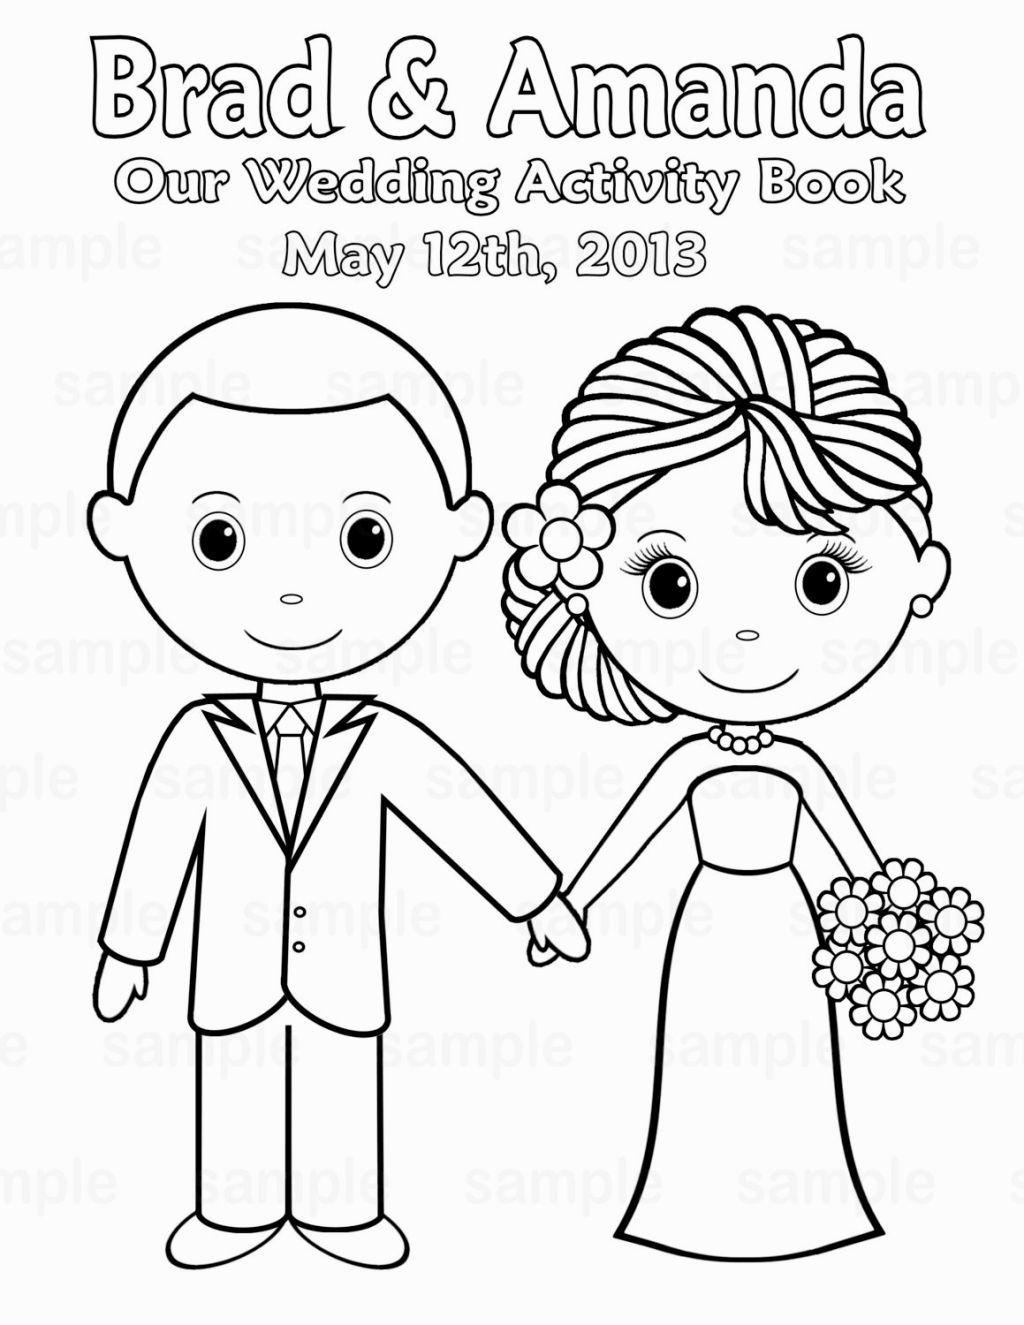 Wedding Coloring Book Printable Wedding With Kids Wedding Coloring Pages Kids Wedding Activities